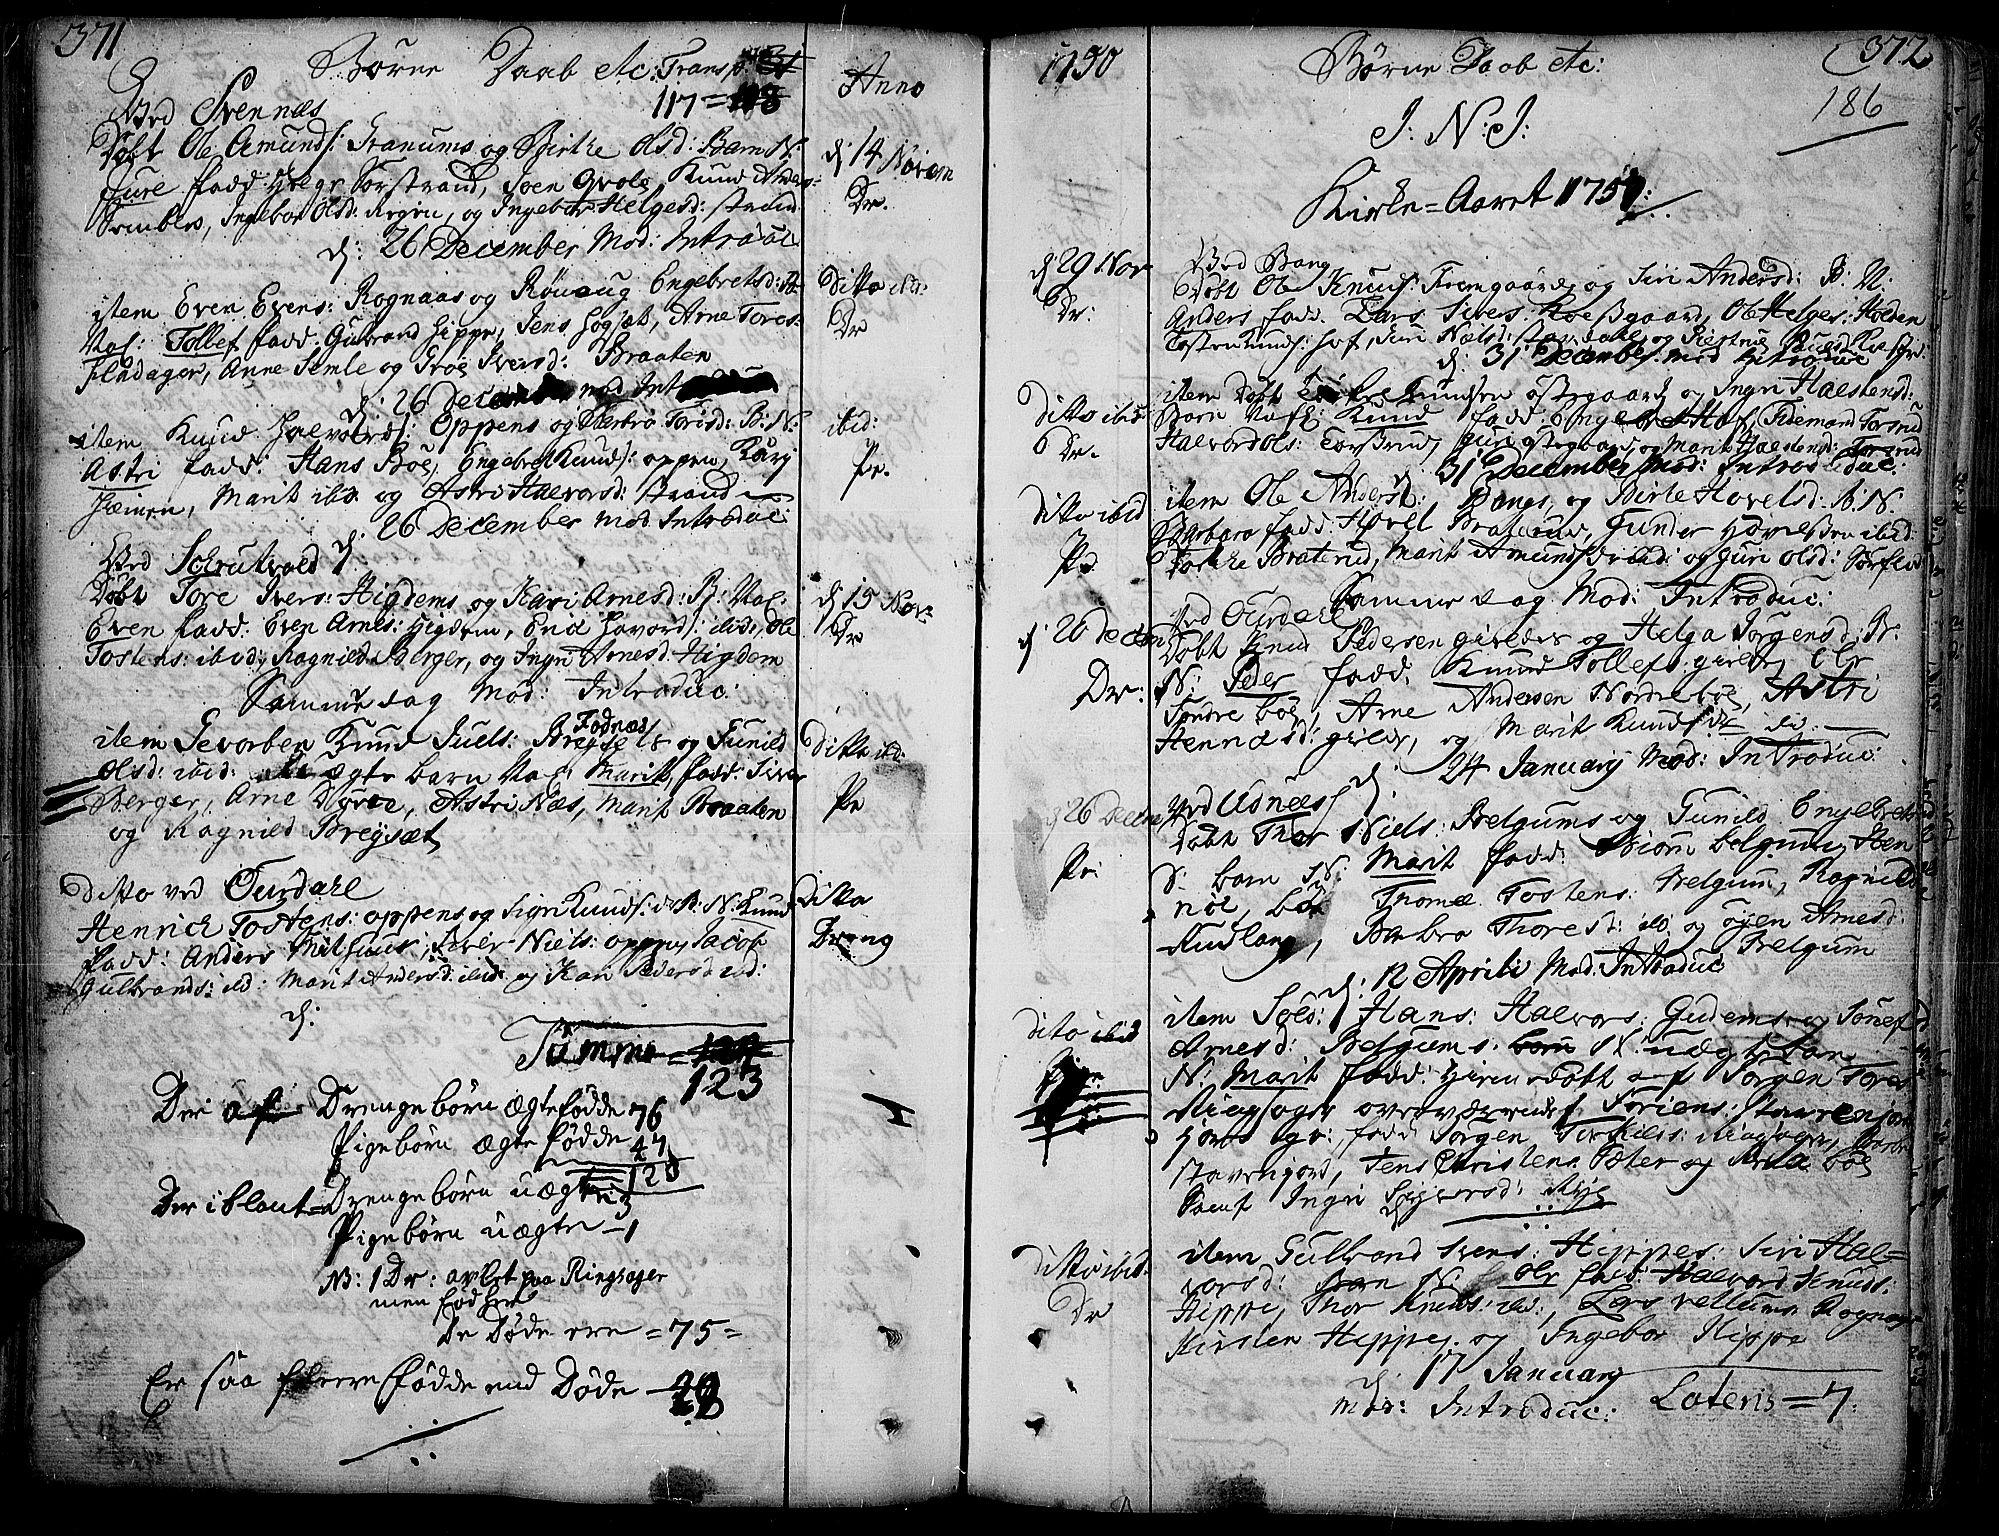 SAH, Aurdal prestekontor, Ministerialbok nr. 4, 1730-1762, s. 371-372